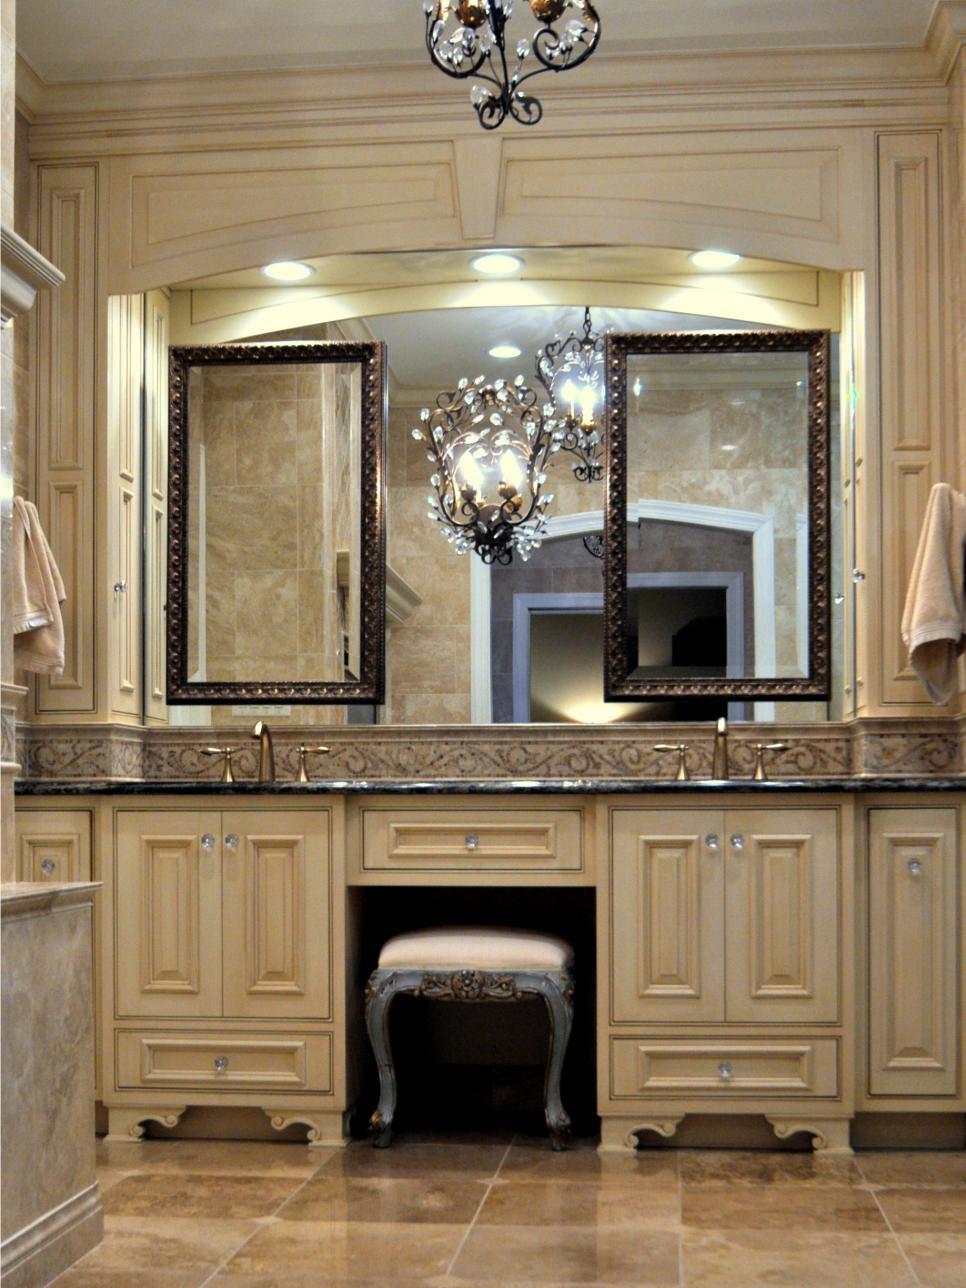 9 Bathroom Vanity Ideas | HGTV